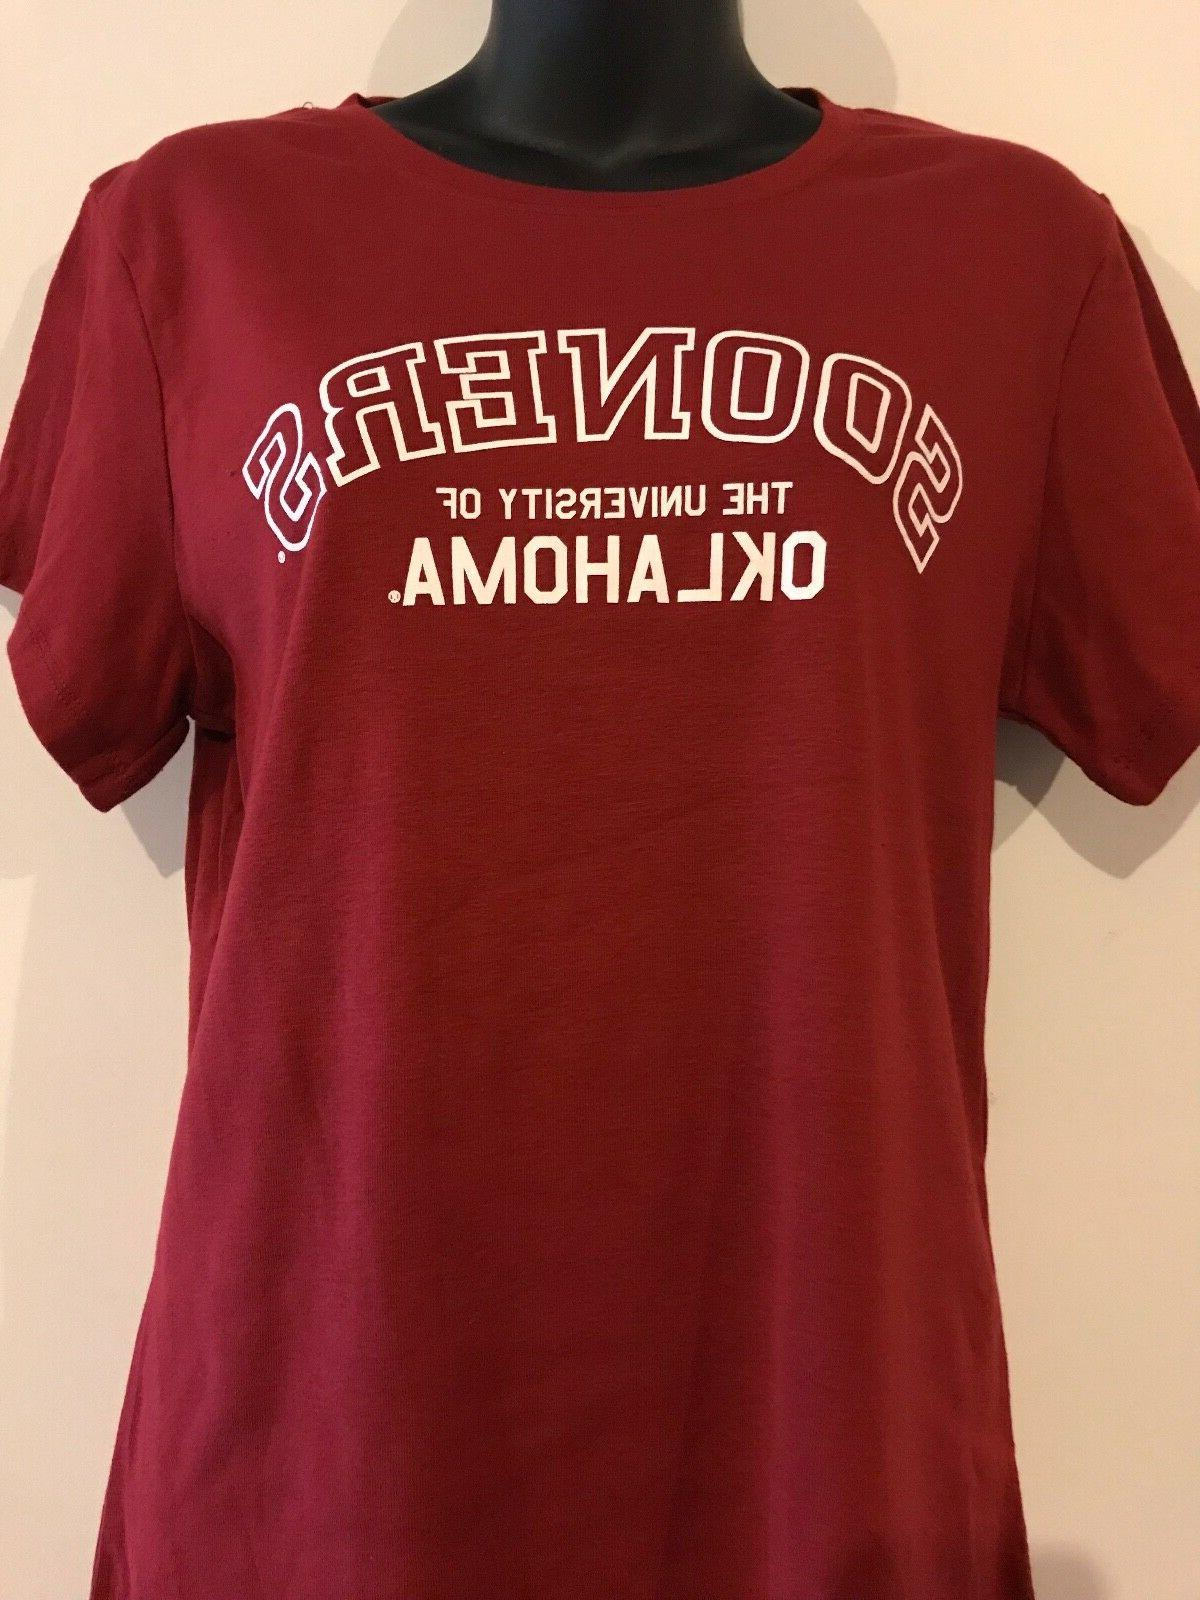 university of oklahoma sooners t shirt women